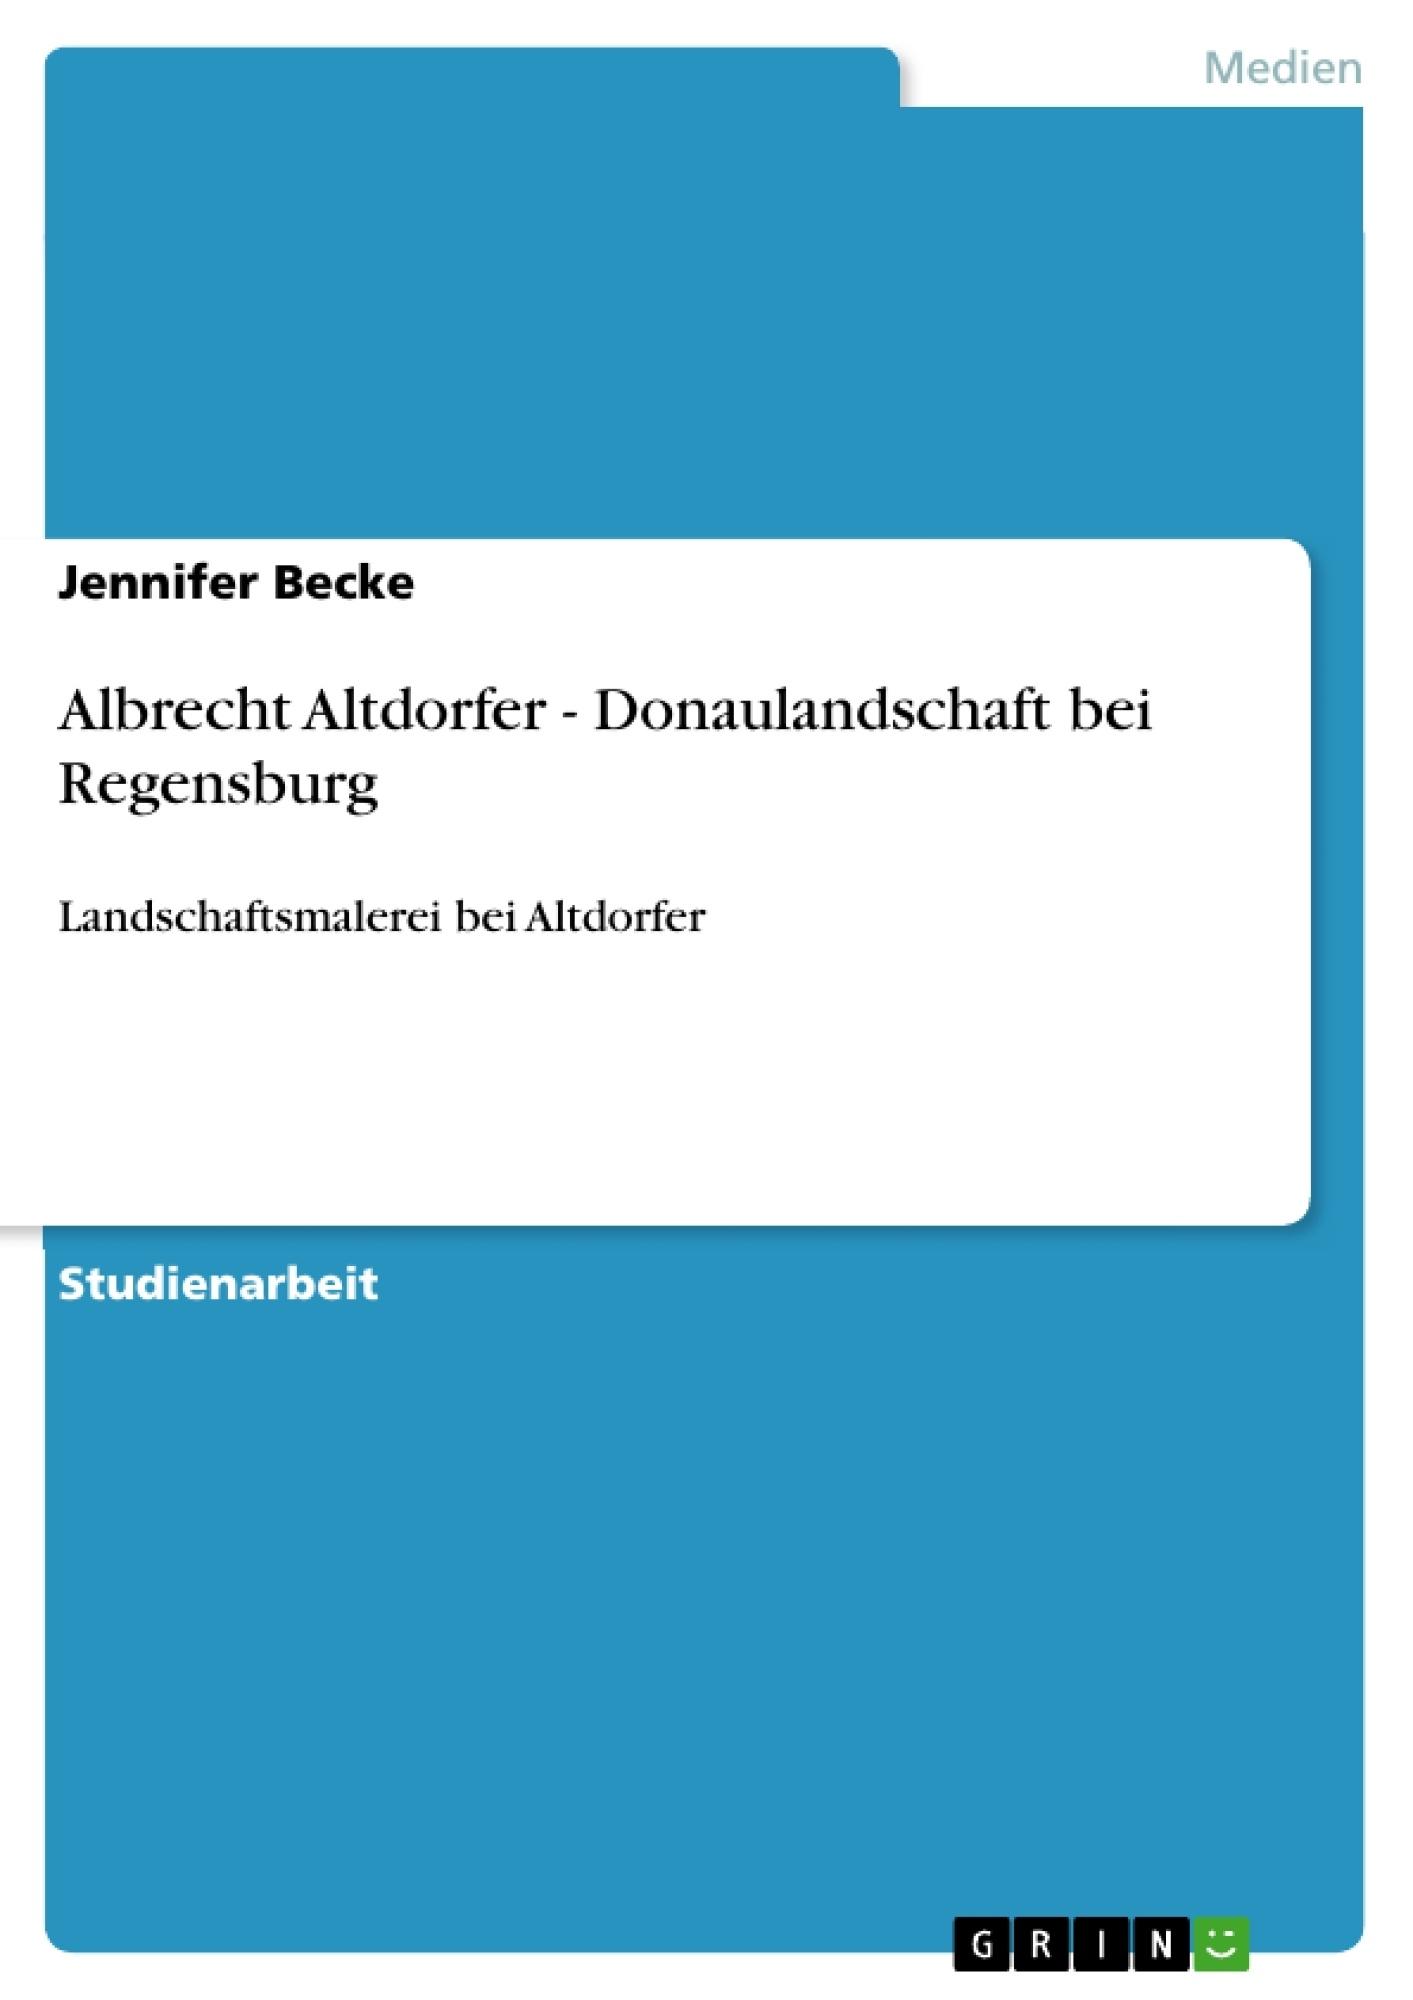 Titel: Albrecht Altdorfer - Donaulandschaft bei Regensburg